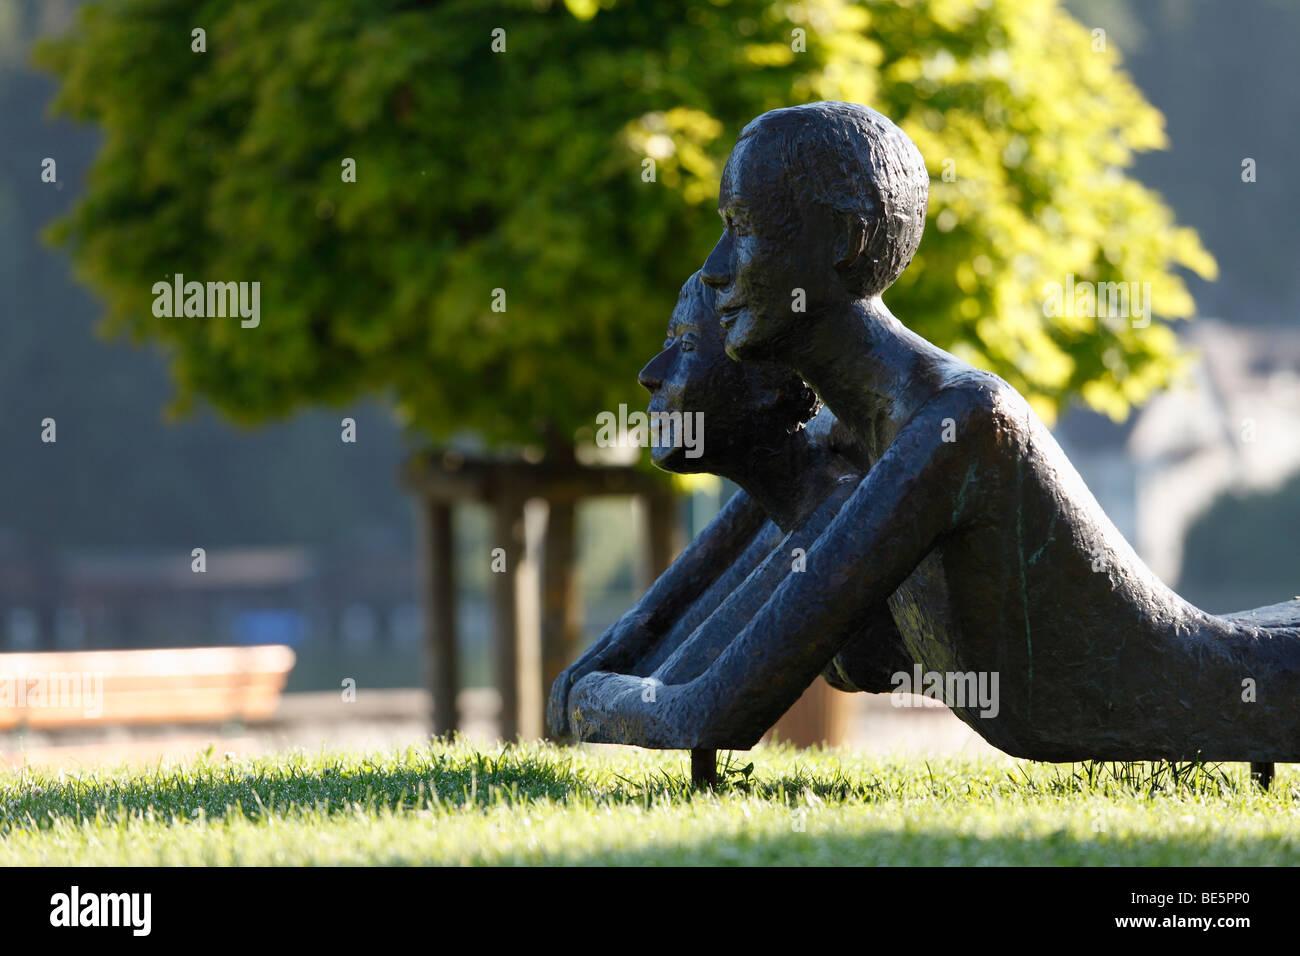 Bronze sculpture in Strobl, Wolfgangsee Lake, Salzkammergut area, Upper Austria, Austria, Europe - Stock Image